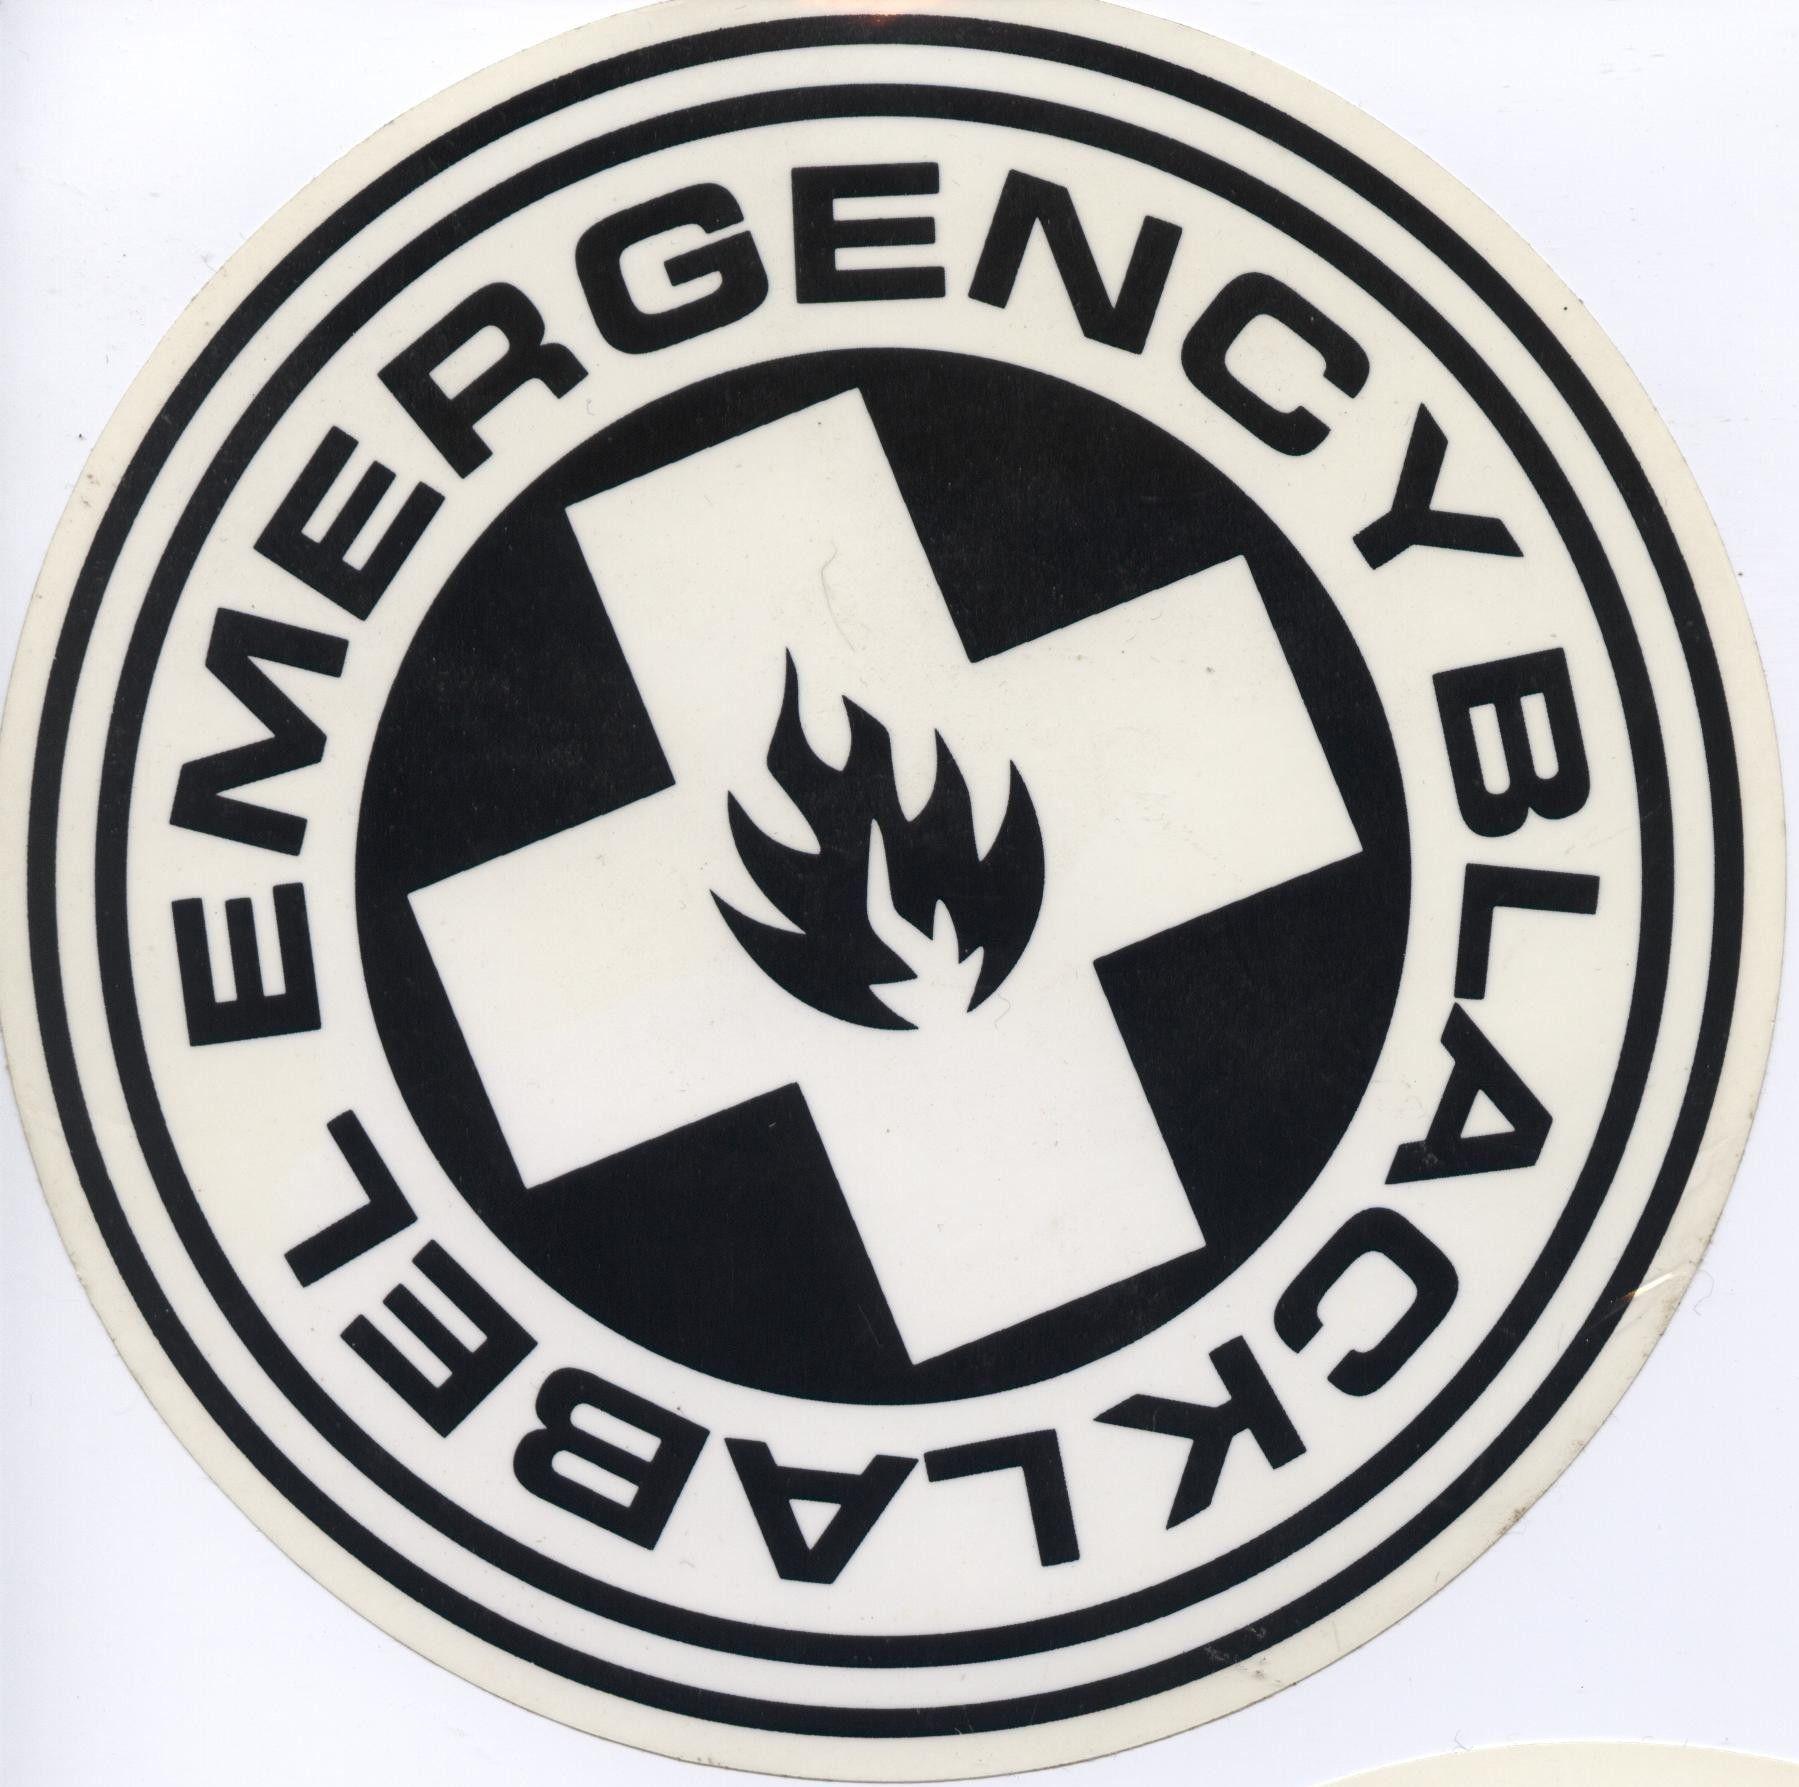 Black Label Skateboards Emergency Logo 6 Sticker Black Label Skateboards Skate Stickers Surf Logo [ 1787 x 1799 Pixel ]